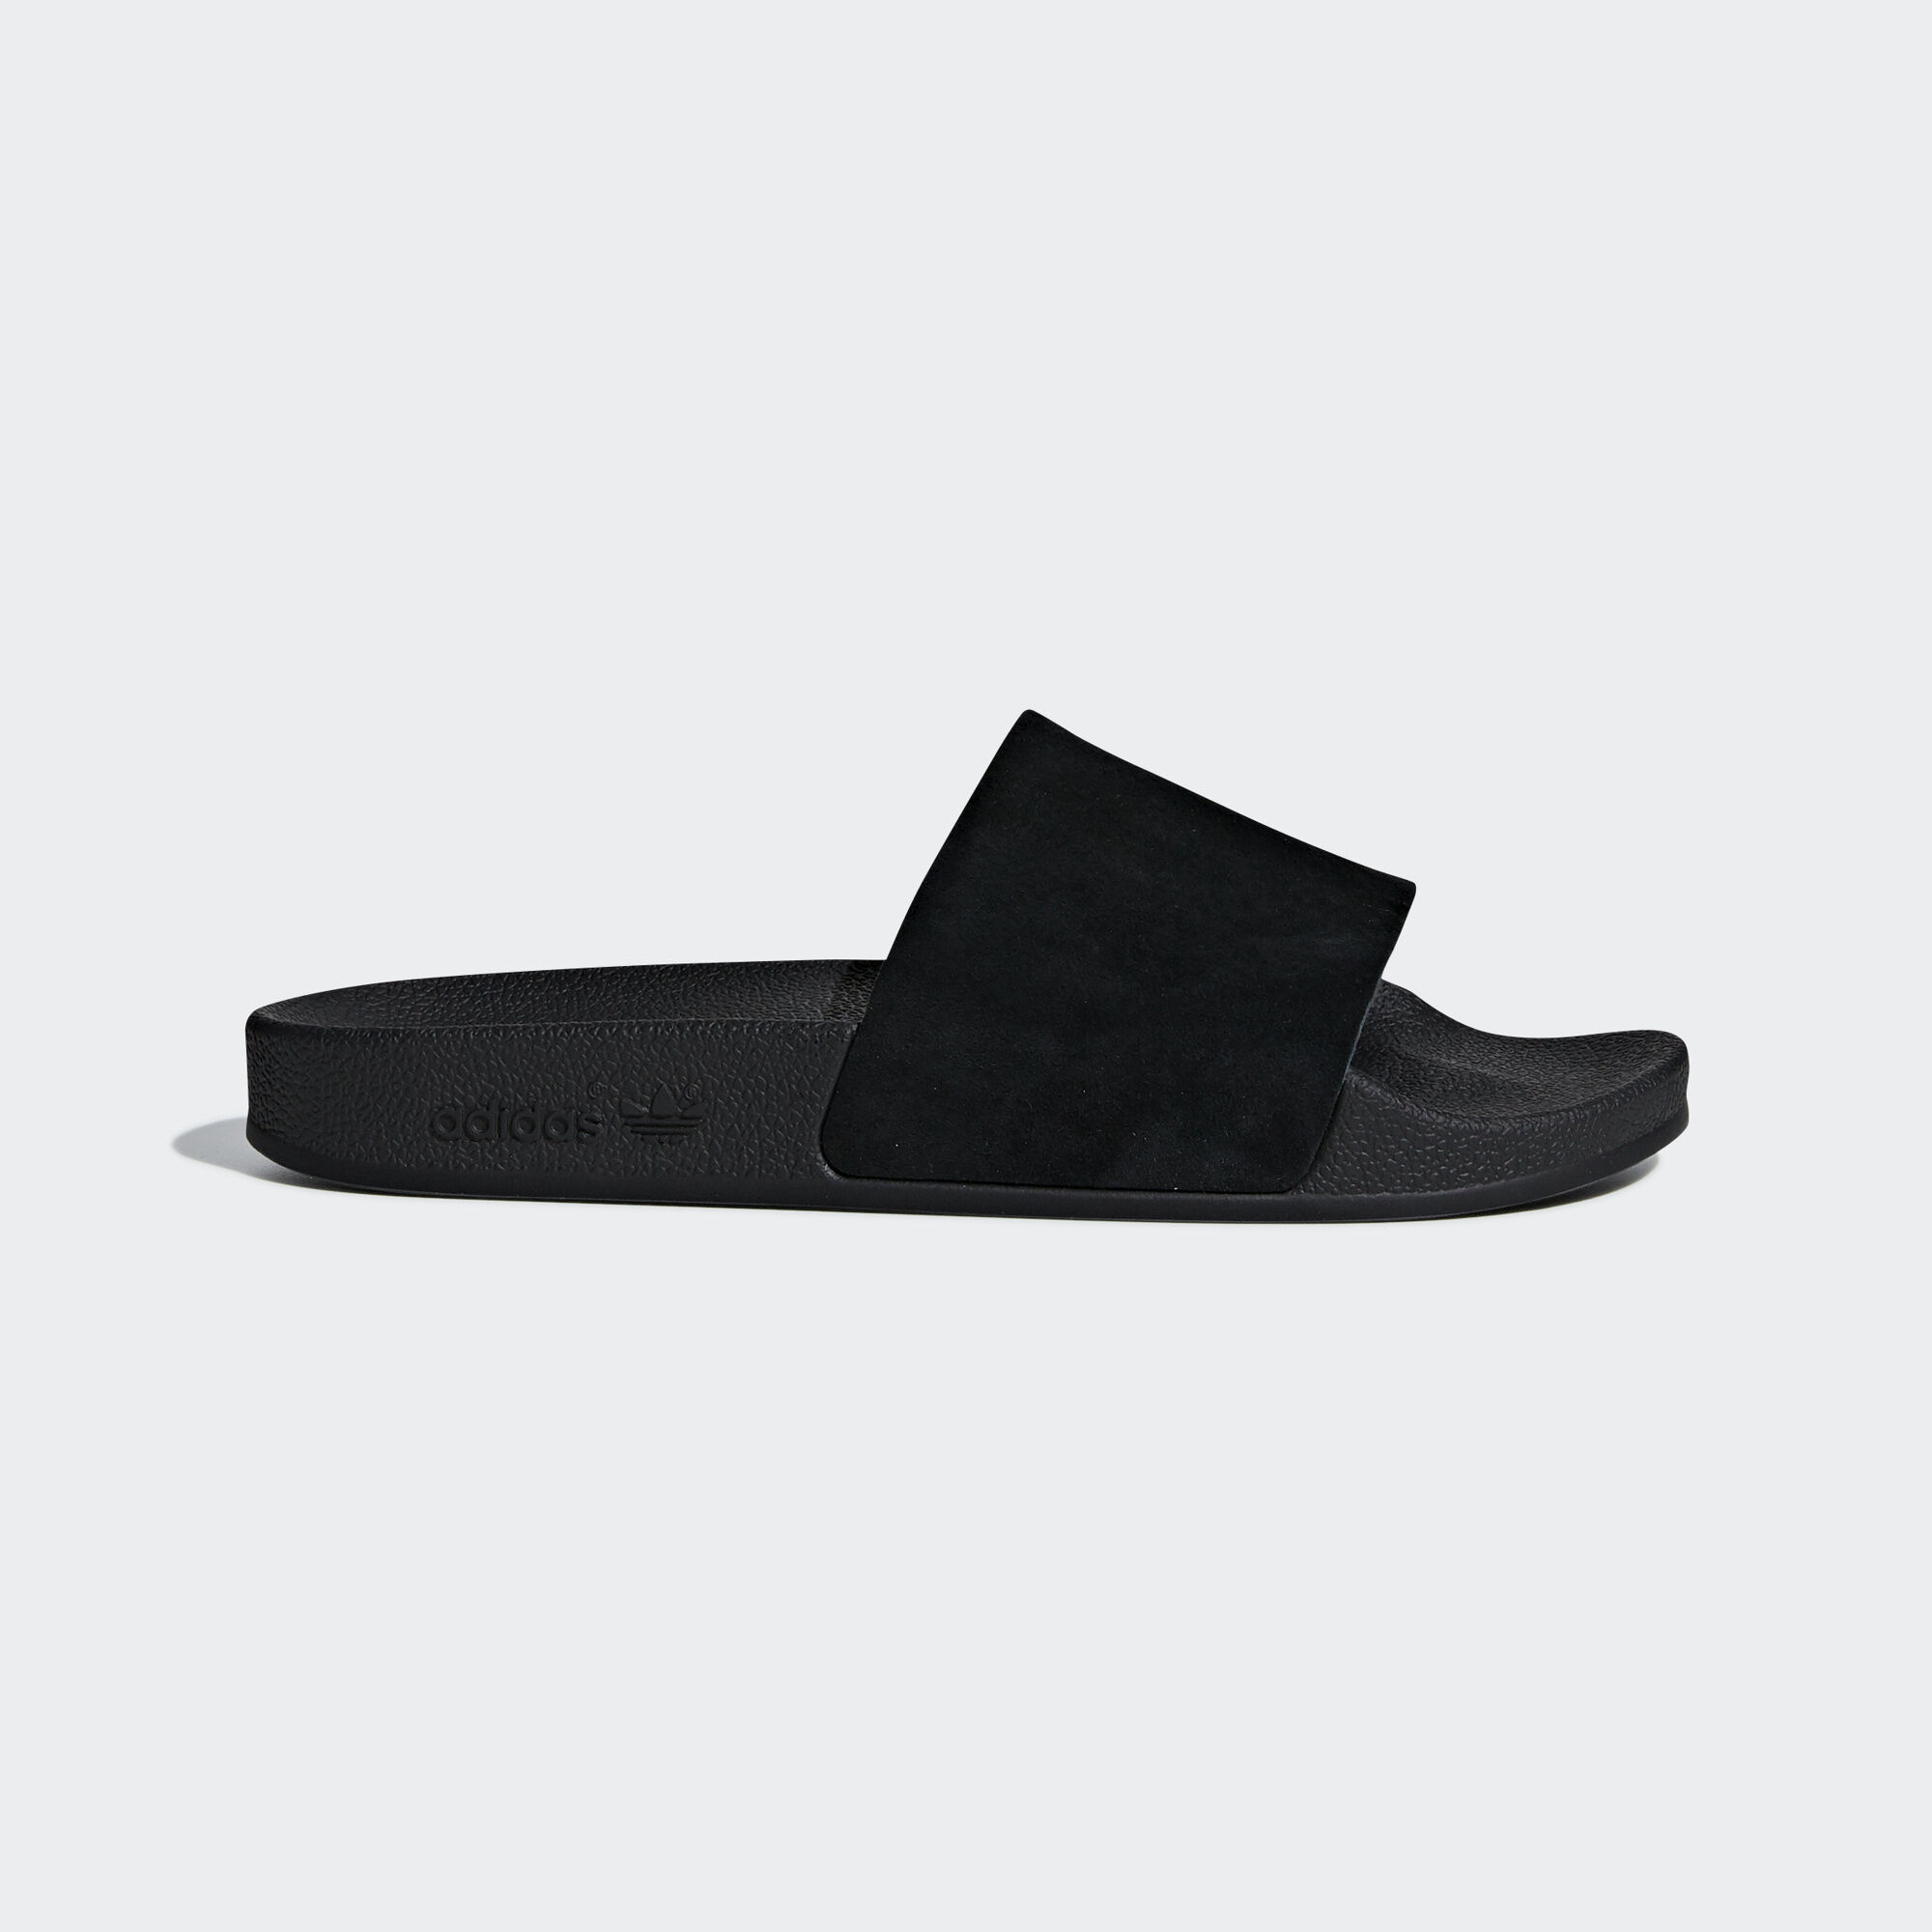 684d935a8e12c9 adidas - Adilette Slides Core Black   Core Black   Ftwr White DA9017. Women  Originals